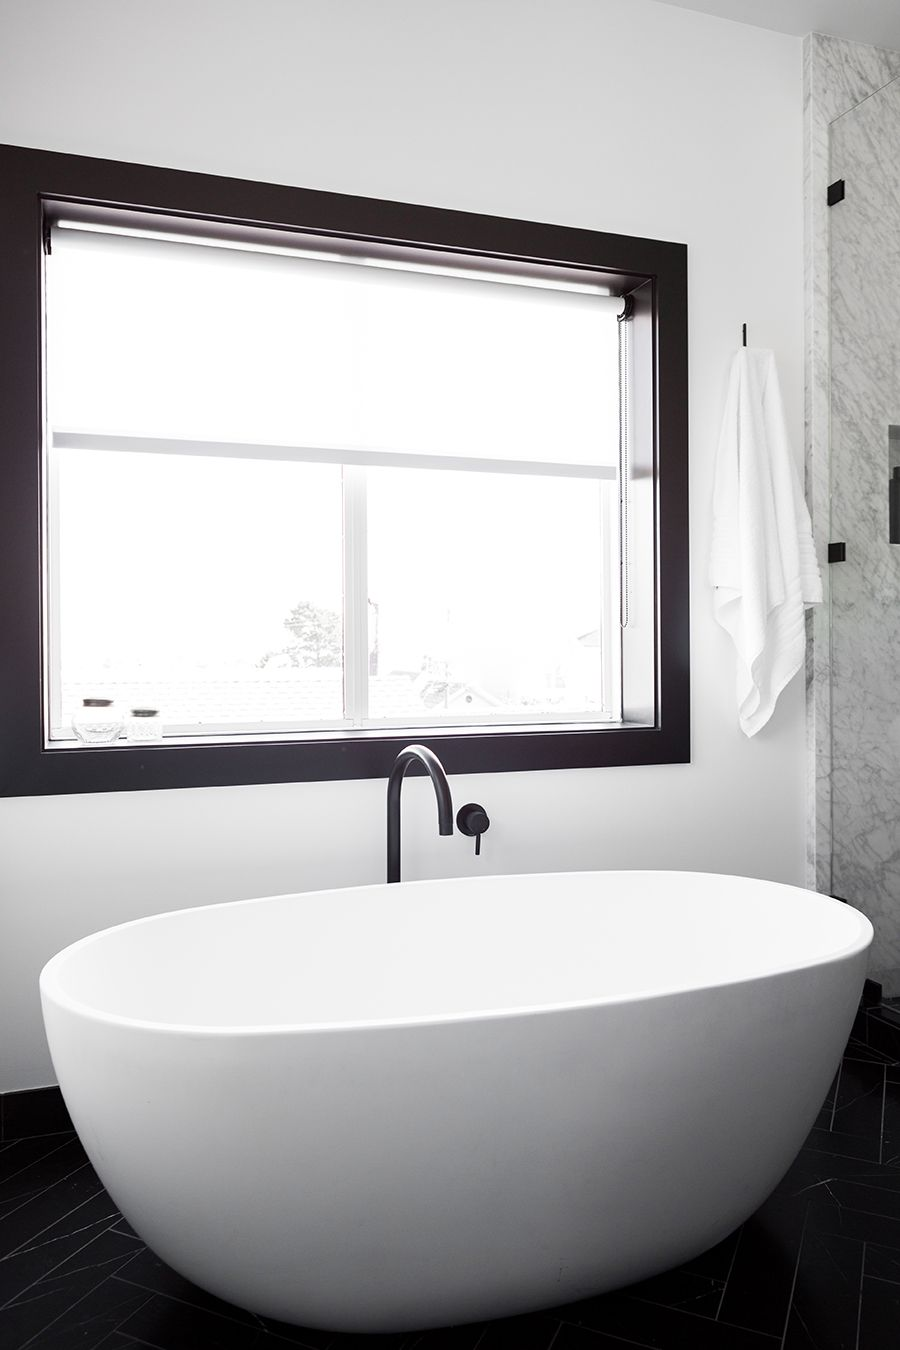 San Francisco Apartment   Interior Design - Bathroom - Bathtub ...